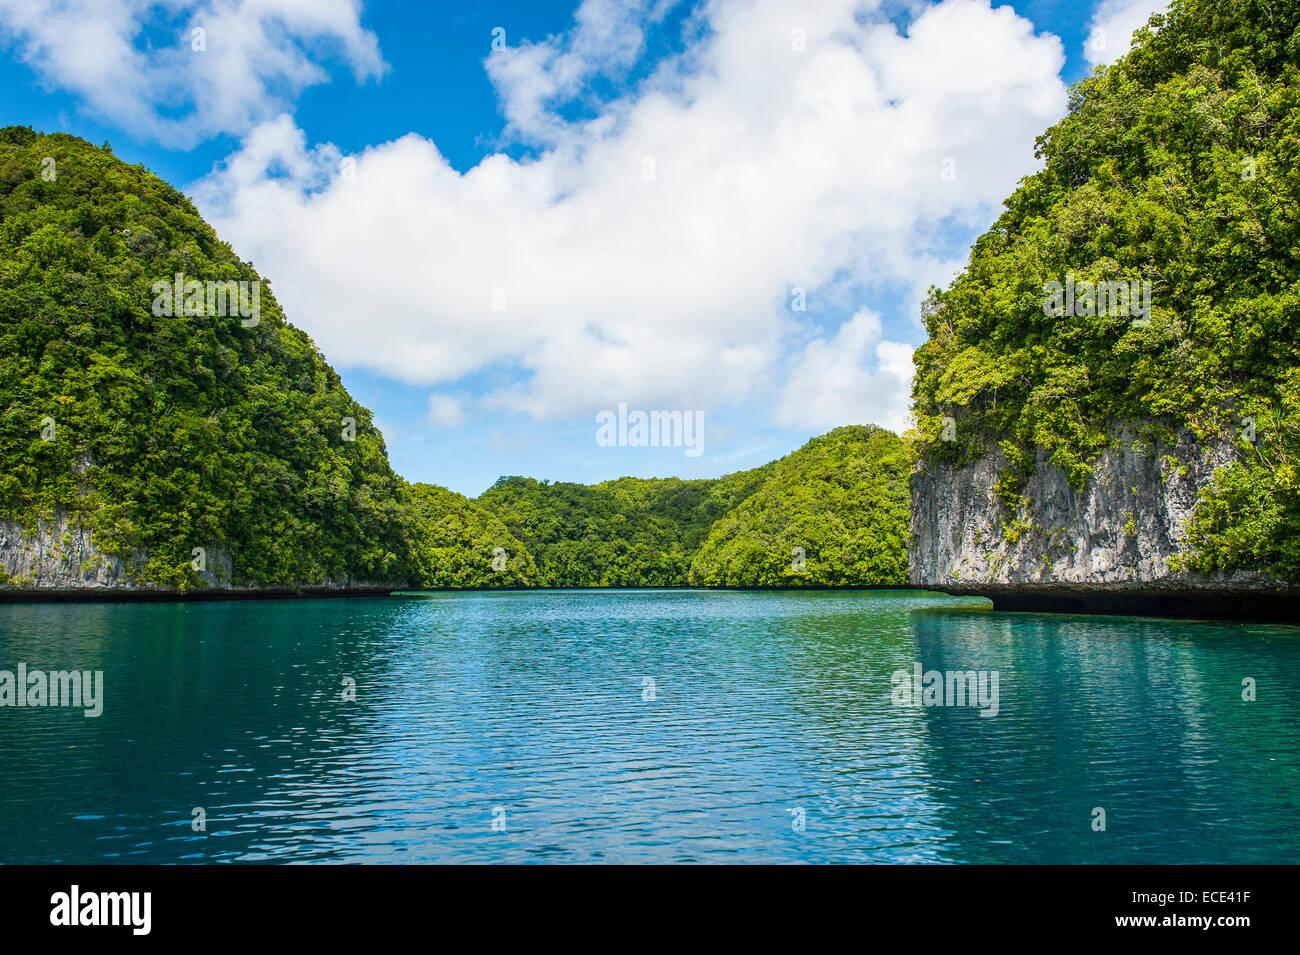 Islands, Rock Islands, Palau, Micronesia - Stock Image